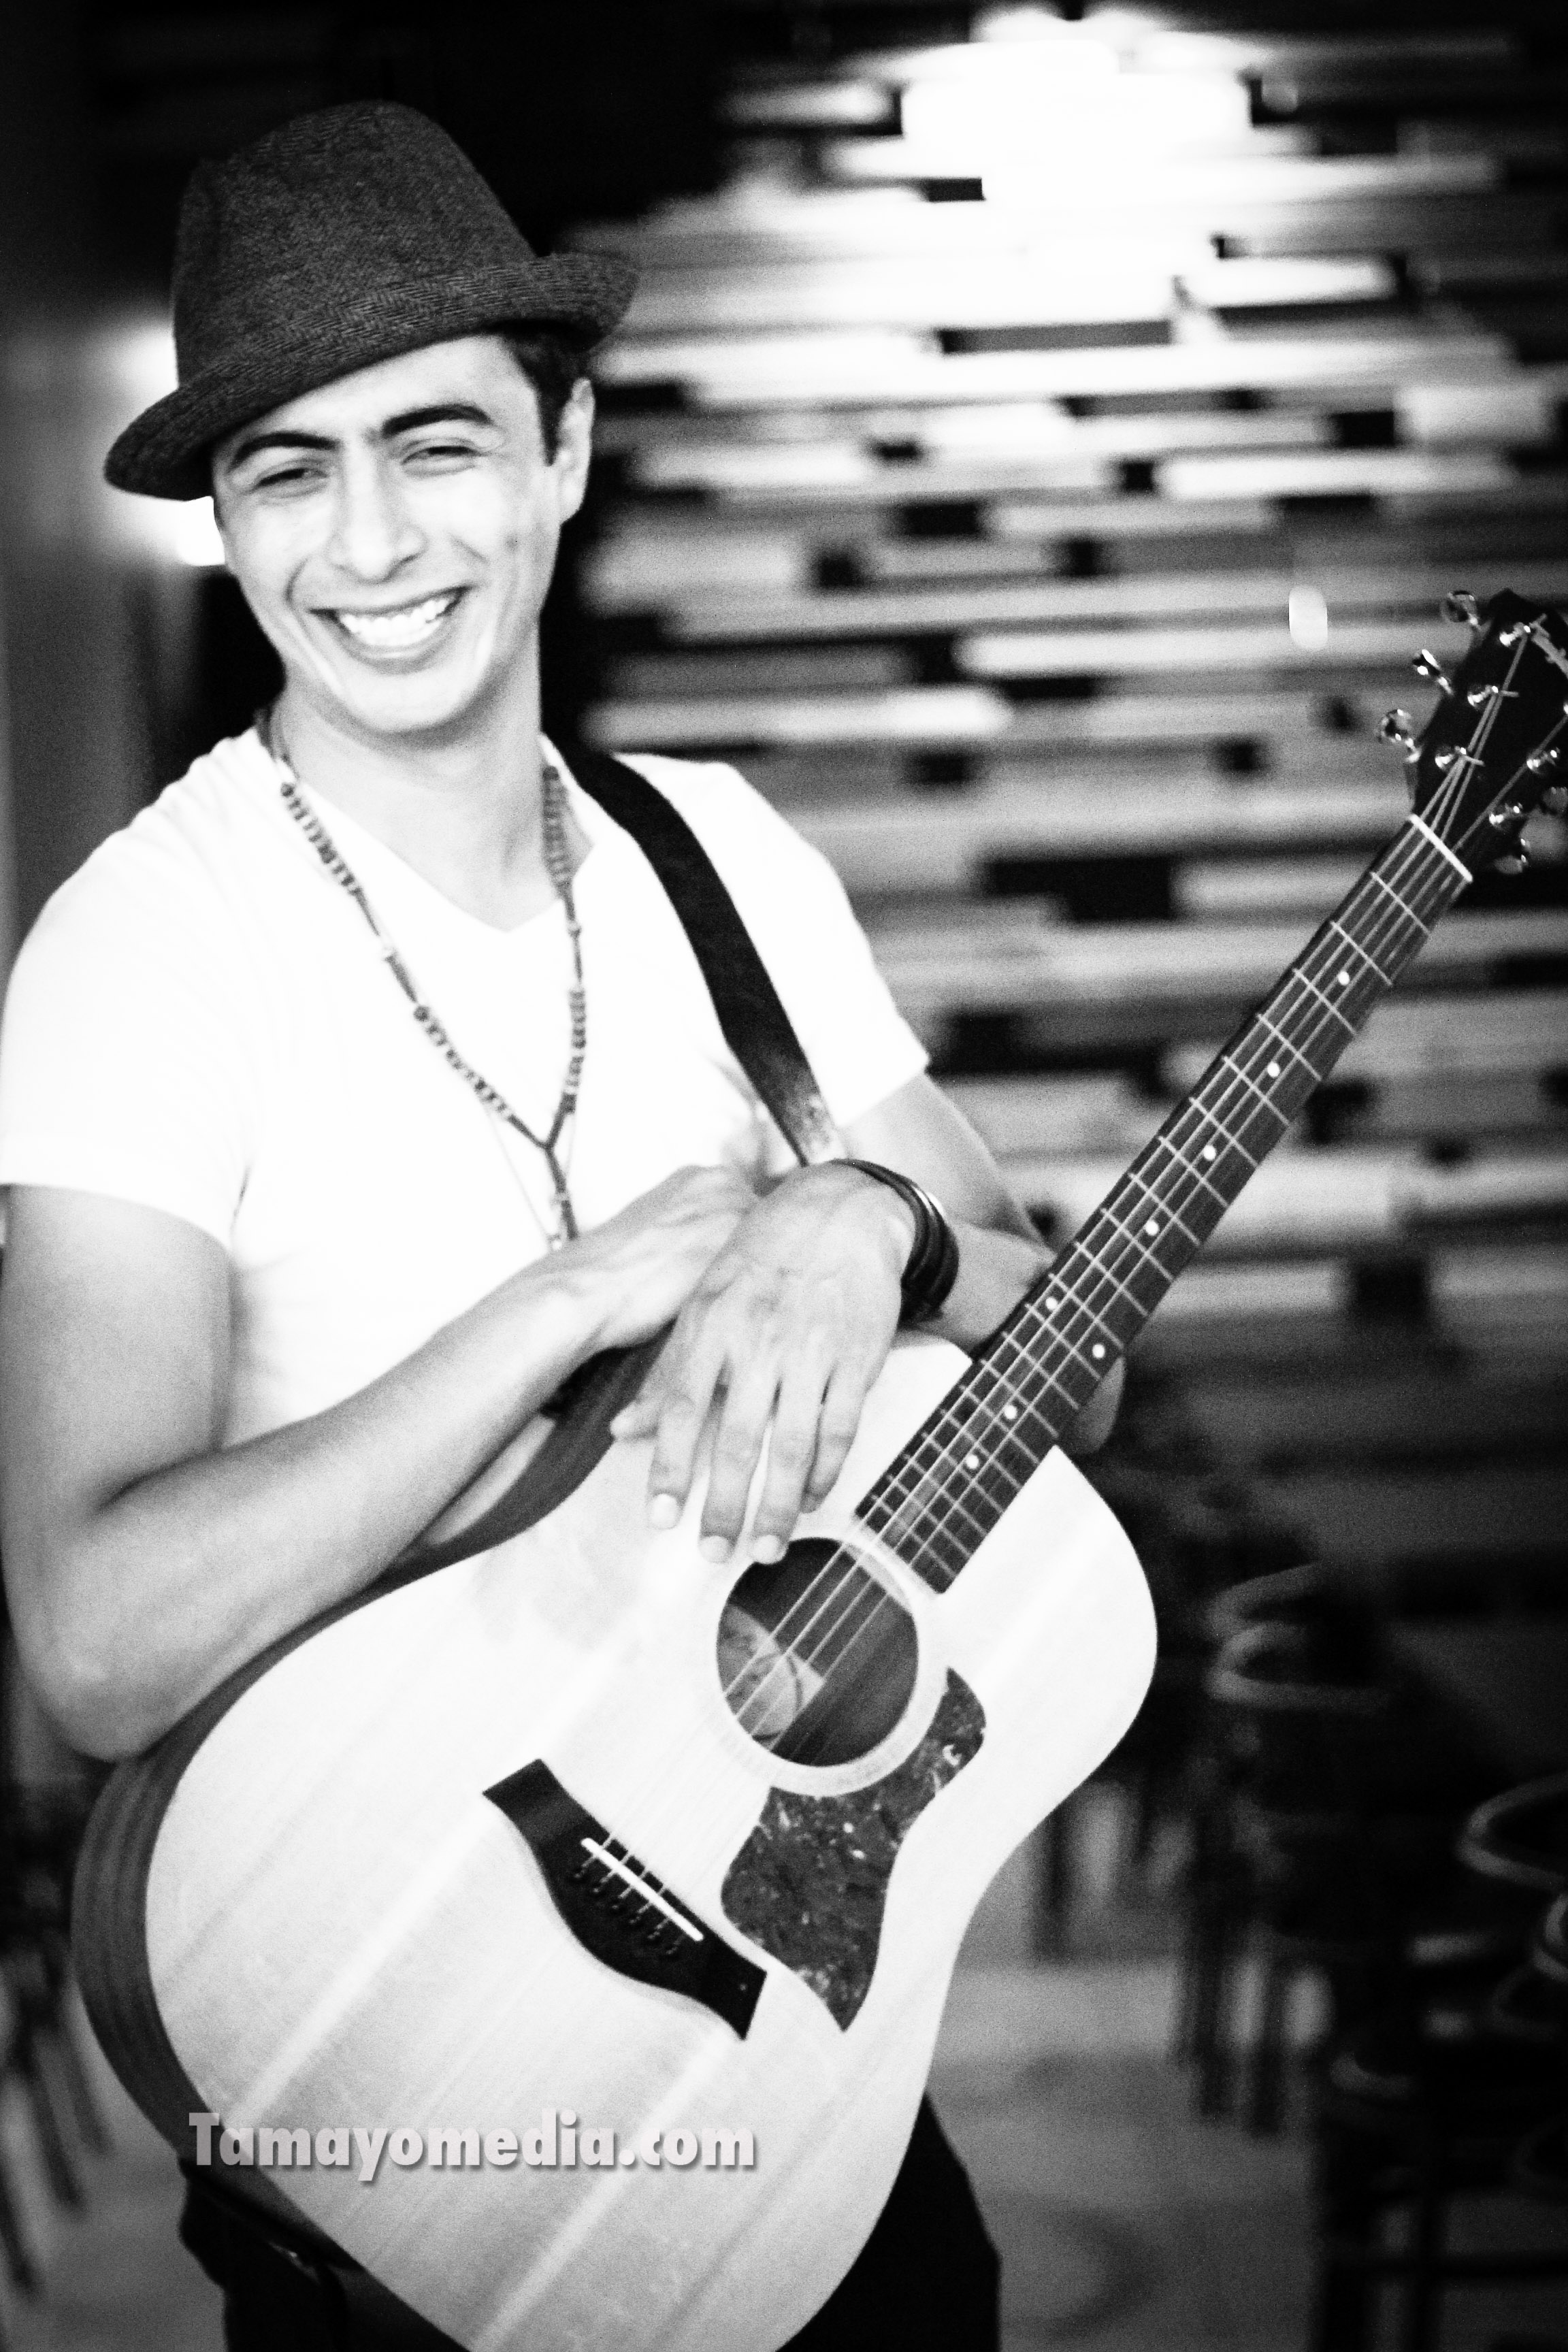 Alex Borja